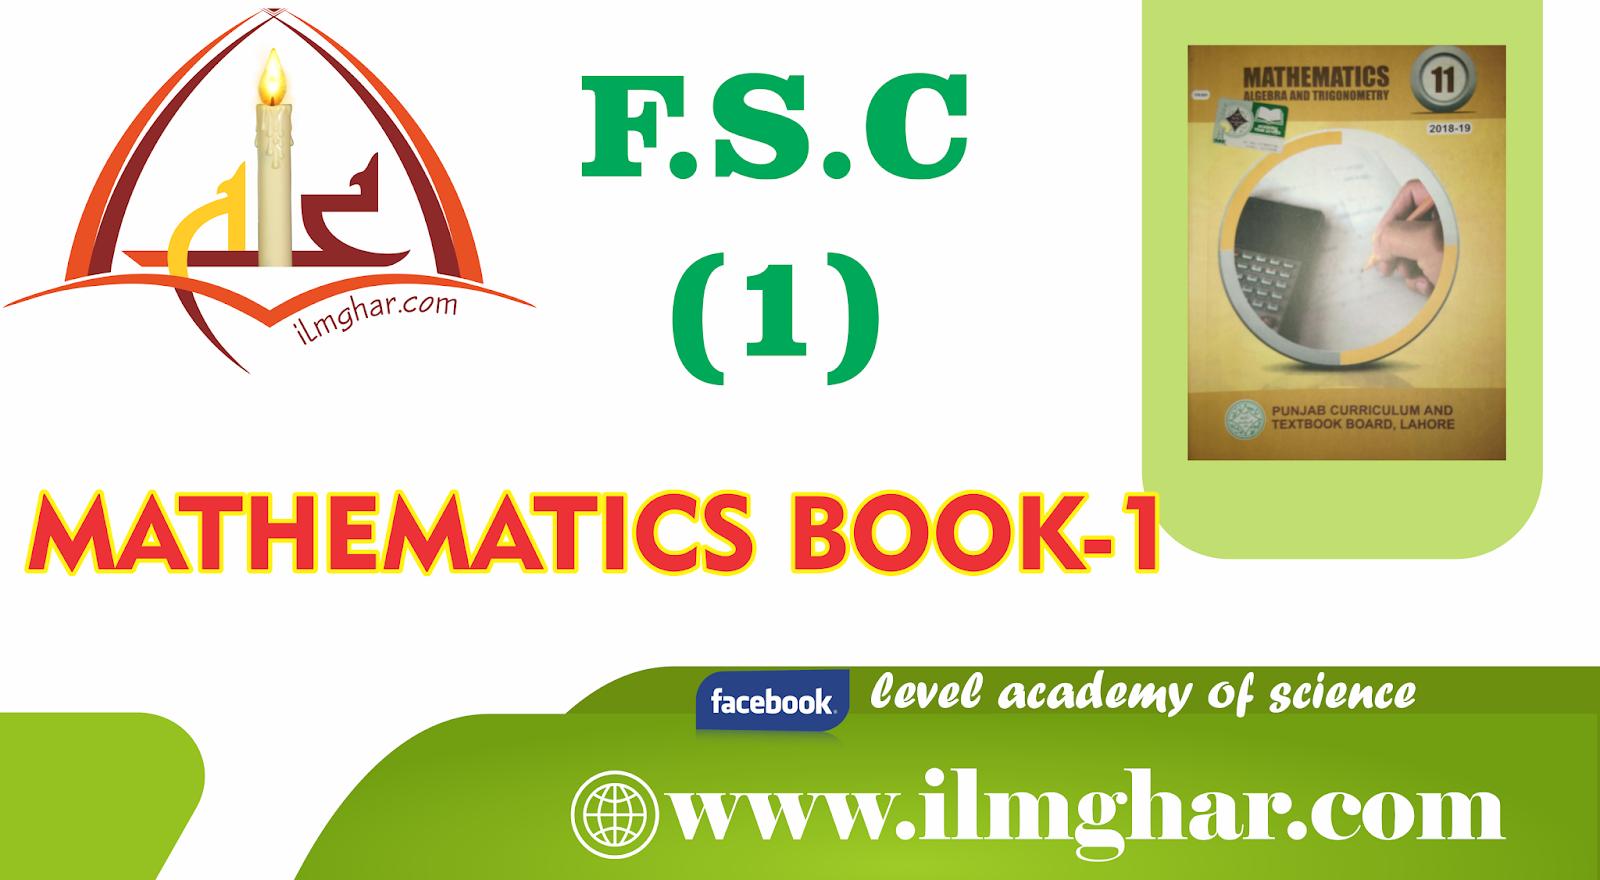 11TH CLASS MATHEMATICS BOOK-1 - ILMGHAR